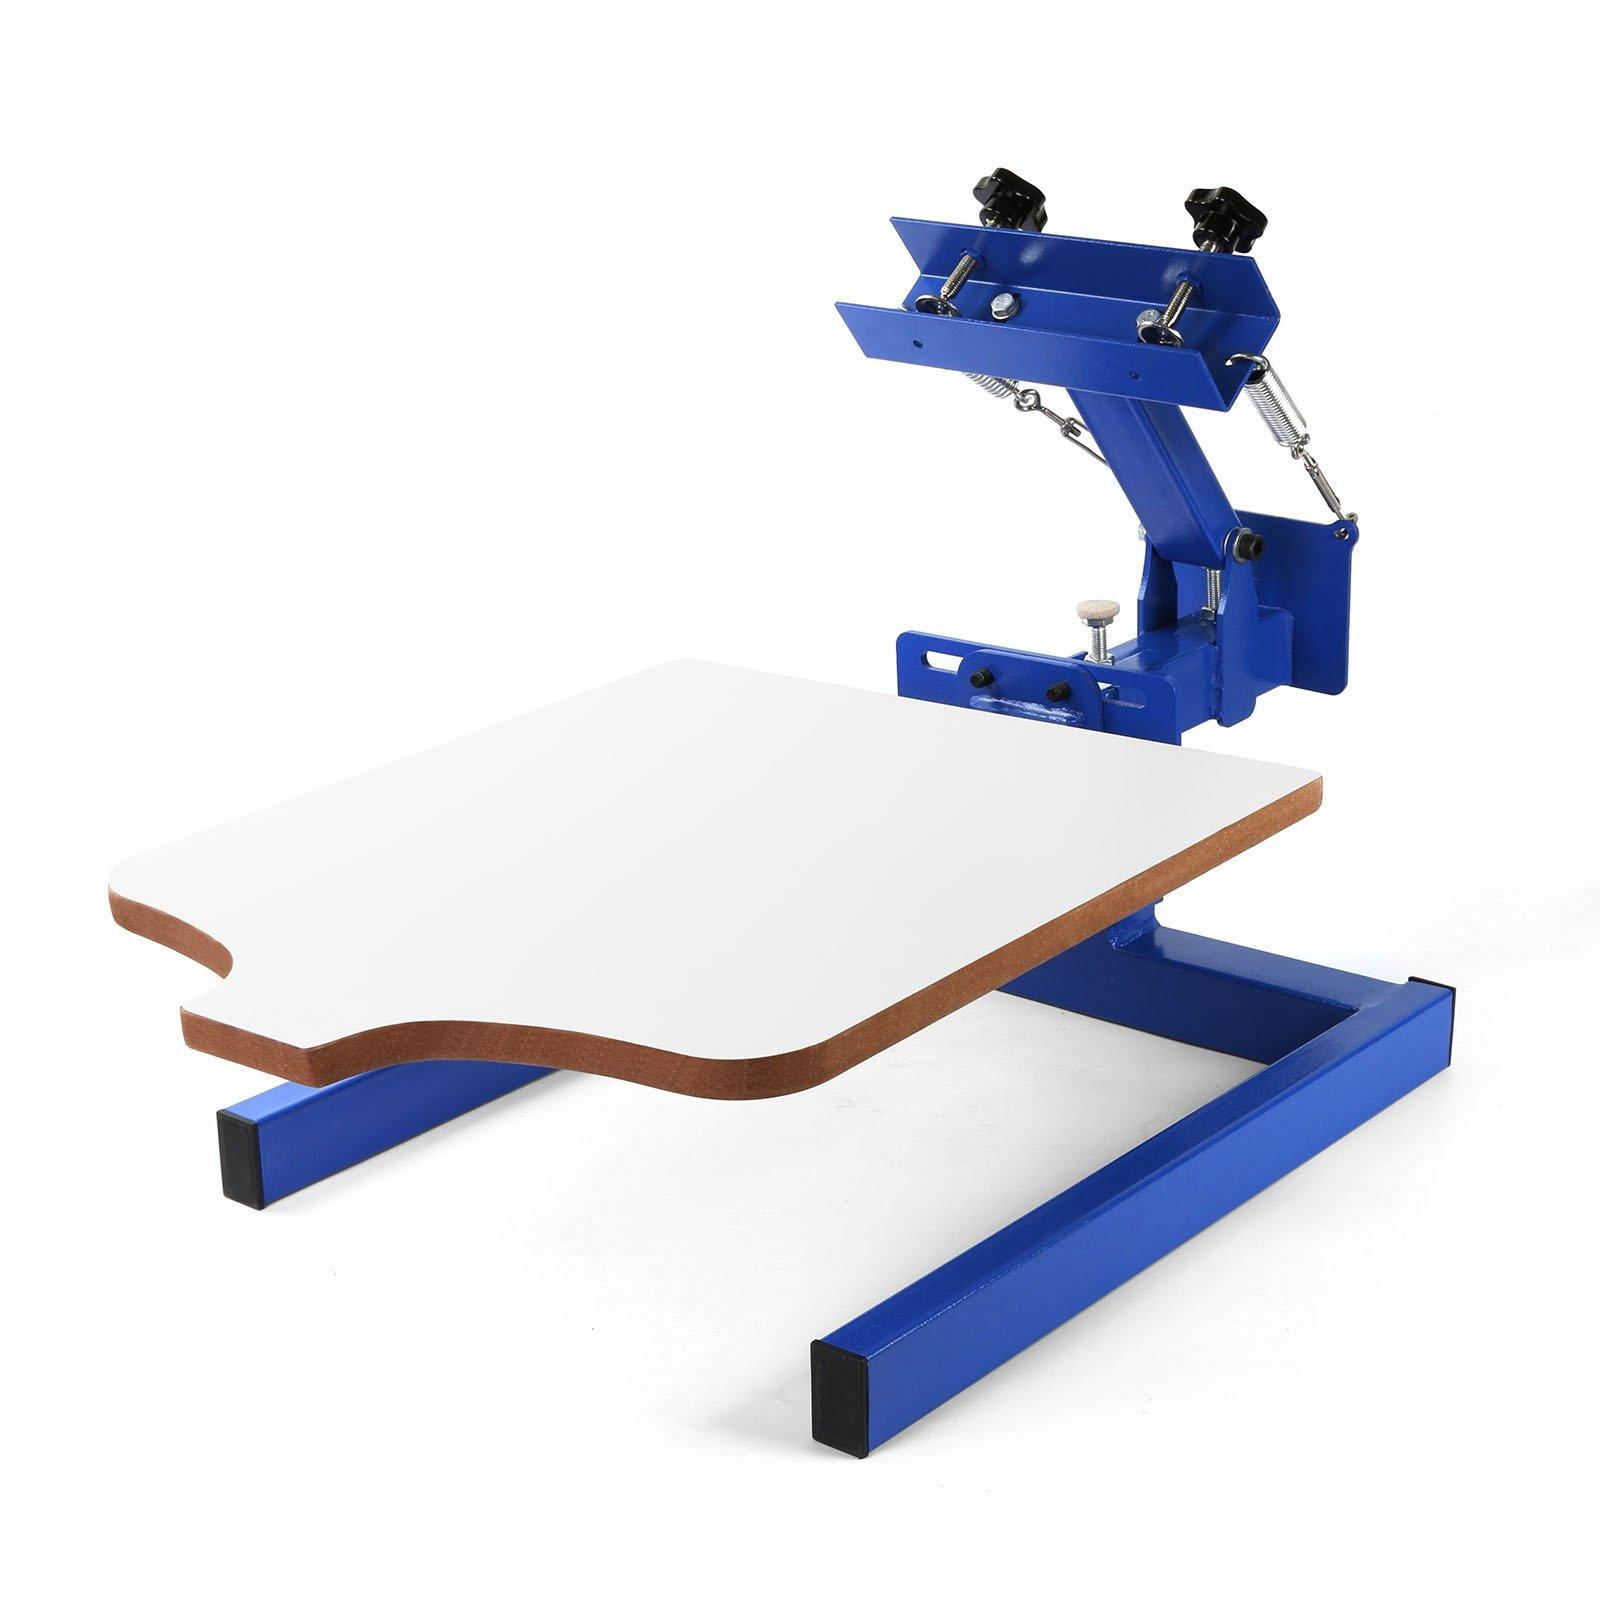 VEVOR Screen Printing Machine 17.7x21.7Inch Screen Printing Press 1 Color 1 Station Silk